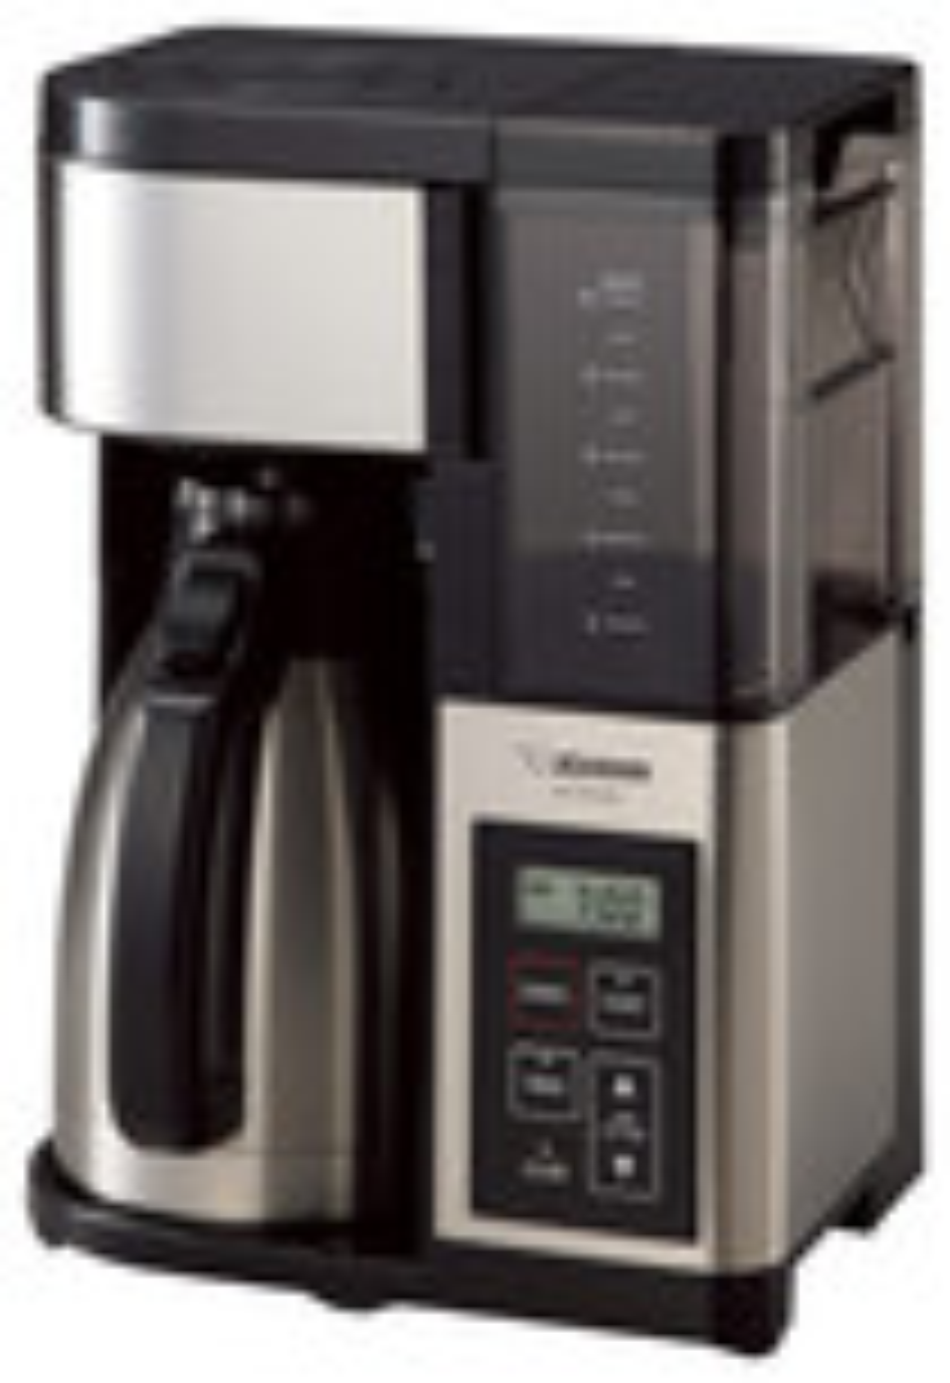 Zojirushi - Fresh Brew Plus 10-cup Coffeemaker - Stainless Steel/black 4331768